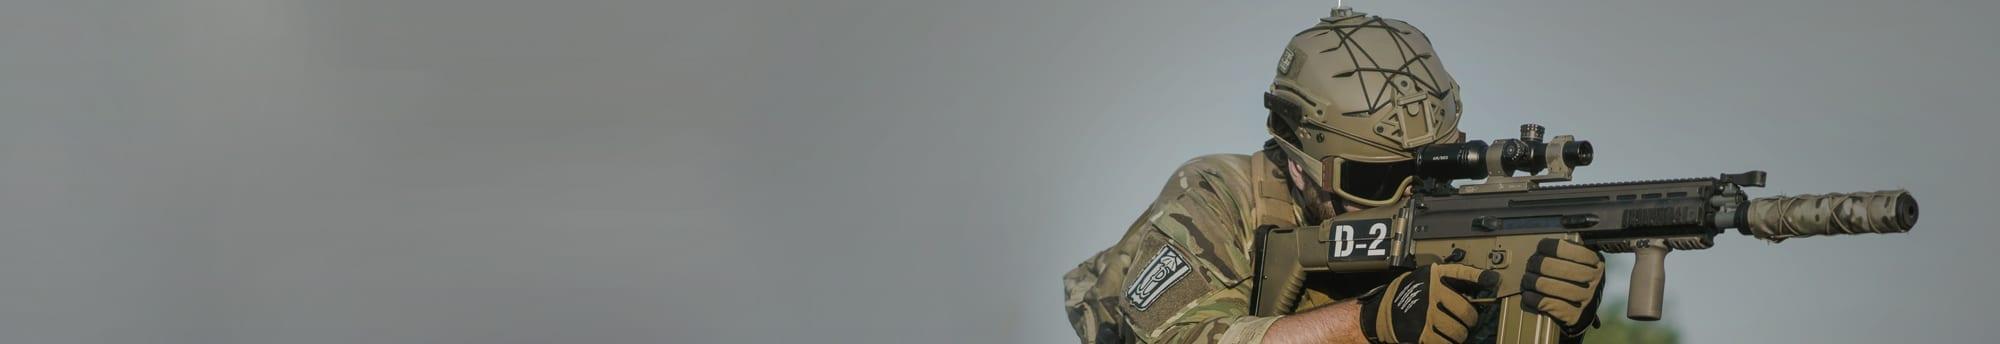 Bundeswehr Bw US Army ear plugs Gehörschutz 3M E-A-R Combat Arms